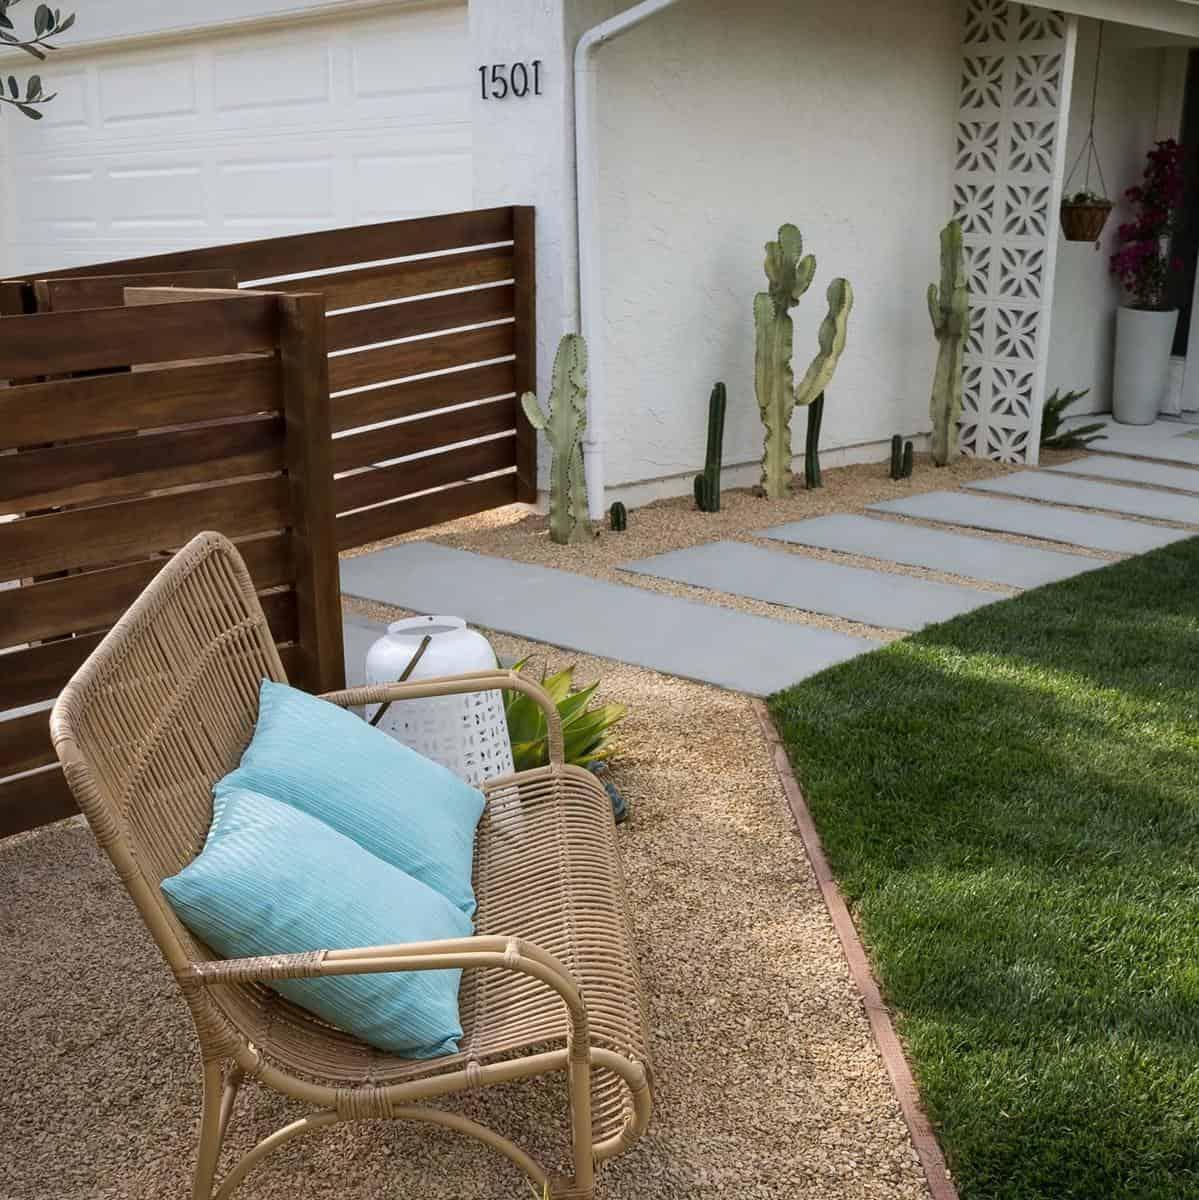 Wicker Rattan Bamboo Garden Bench Ideas -designbybrookside